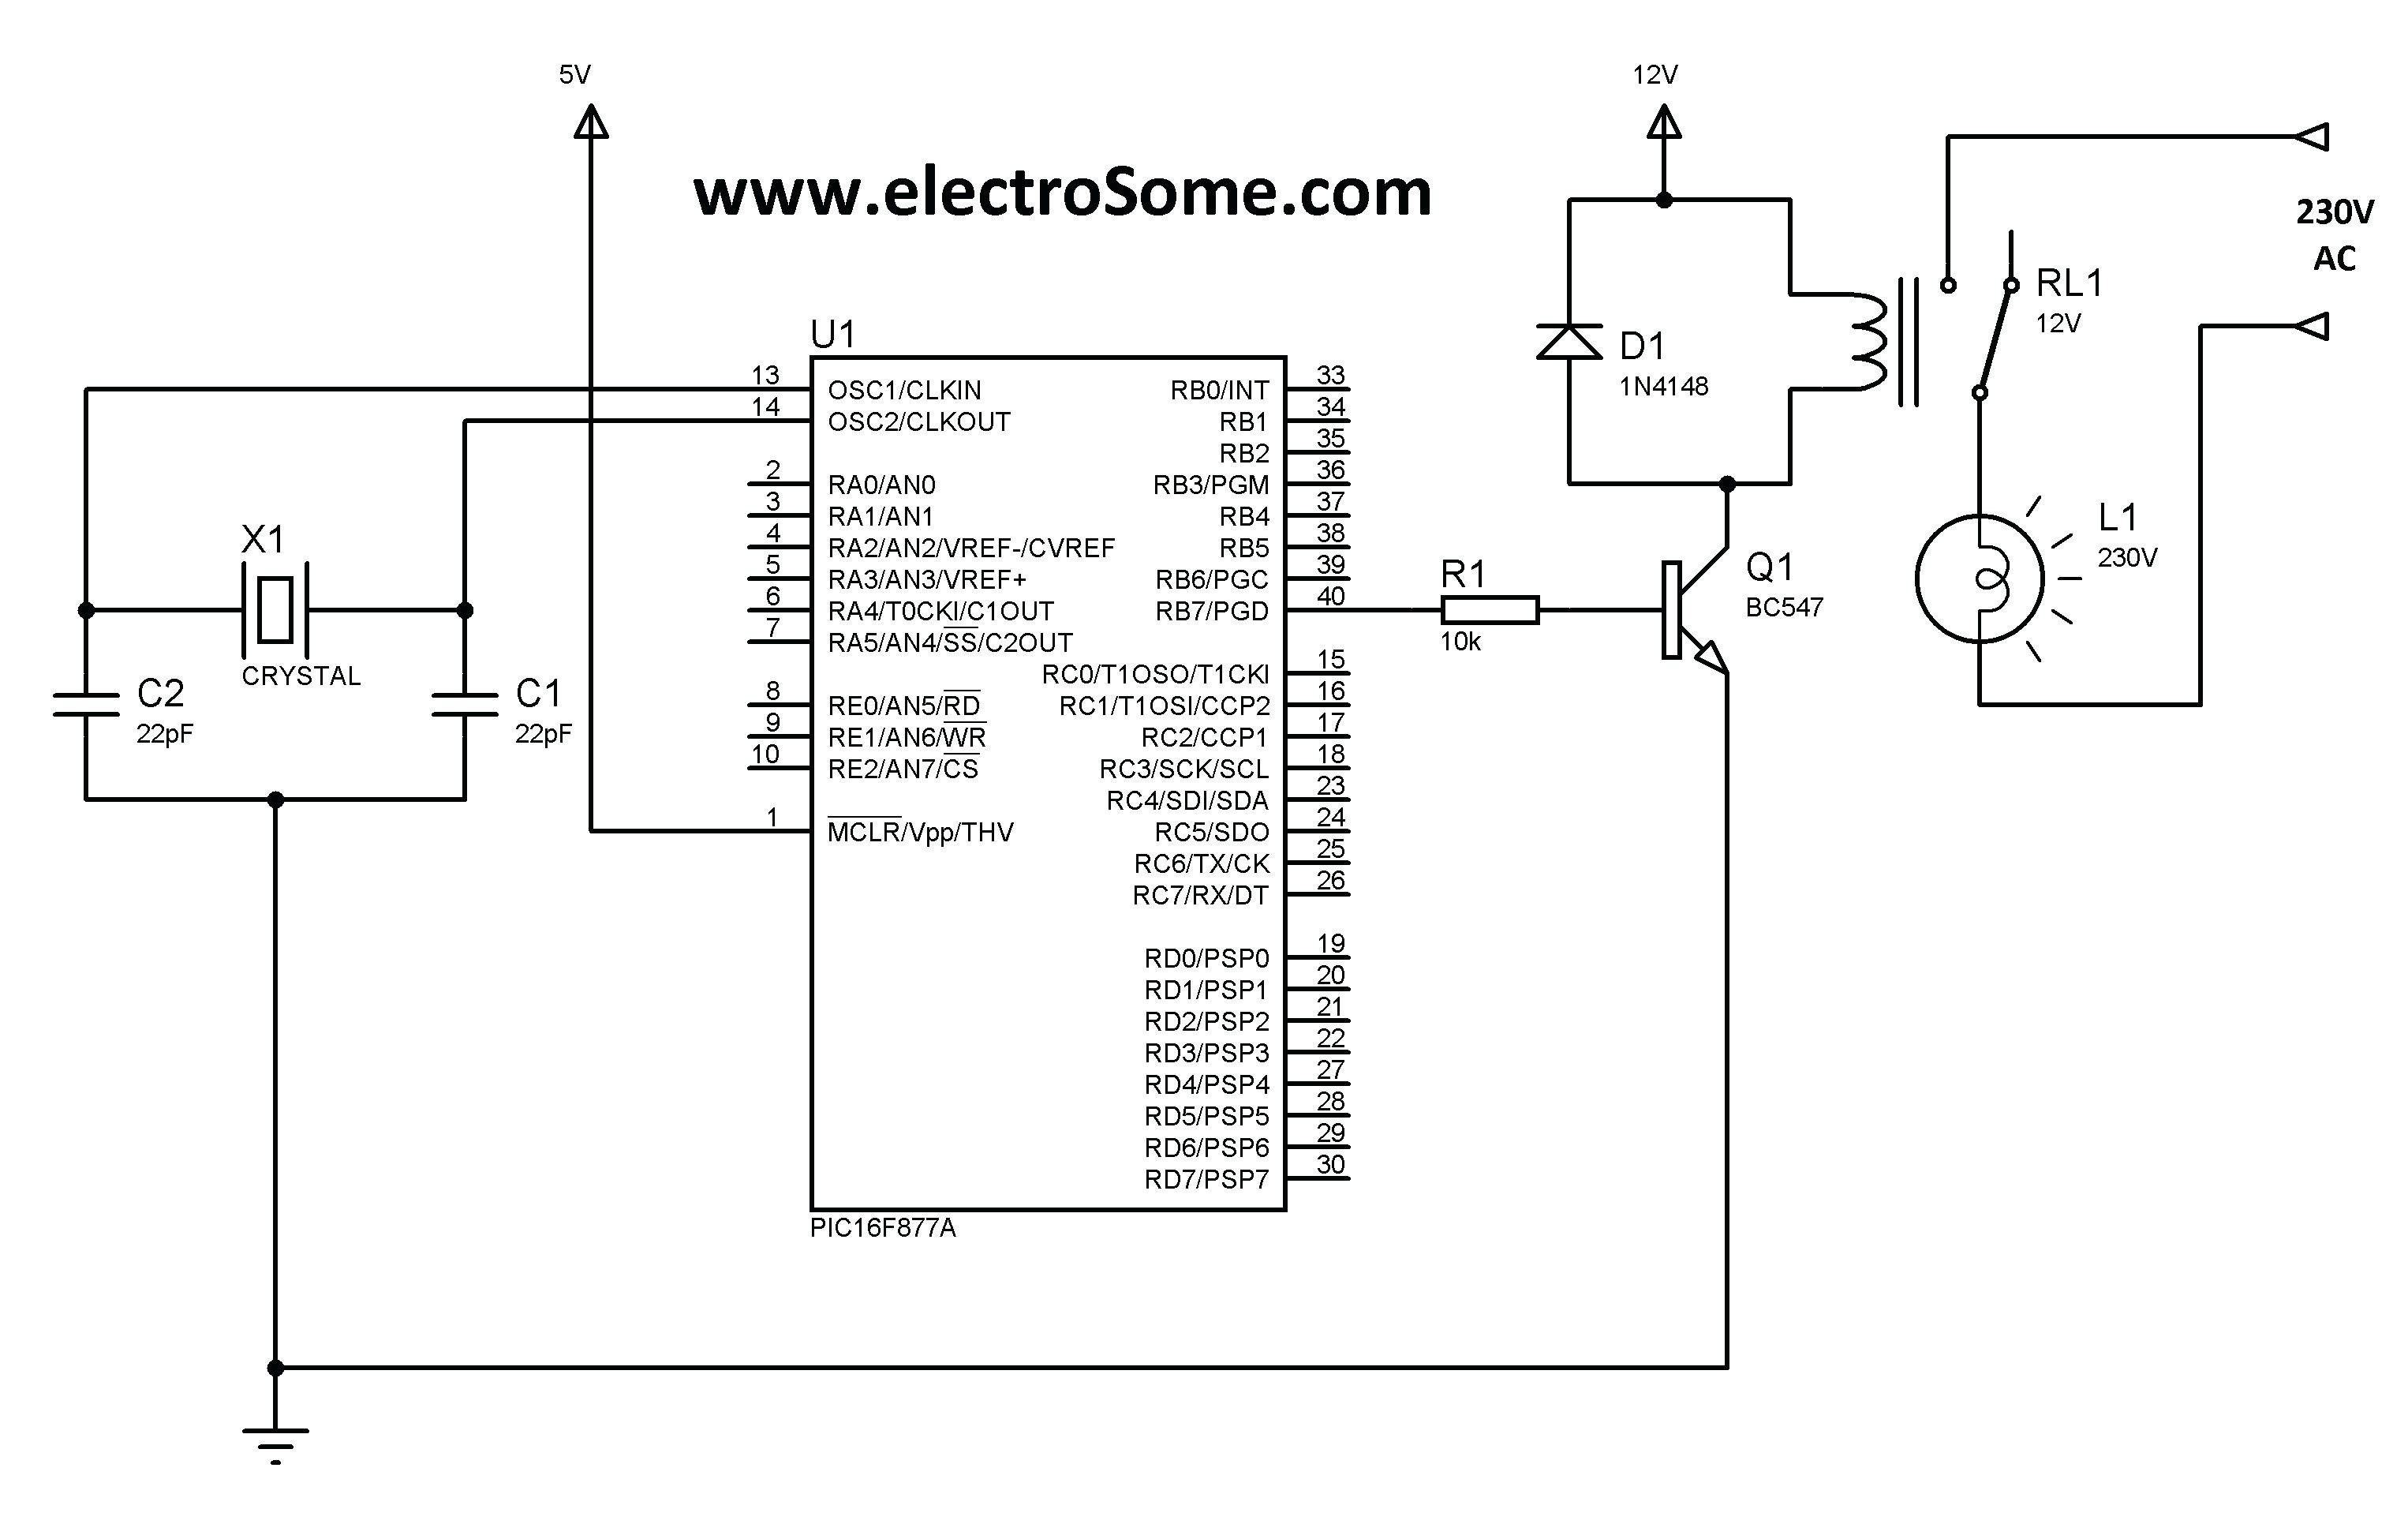 Kickstart Potential Relay Wiring Diagram | Manual E-Books - Potential Relay Wiring Diagram